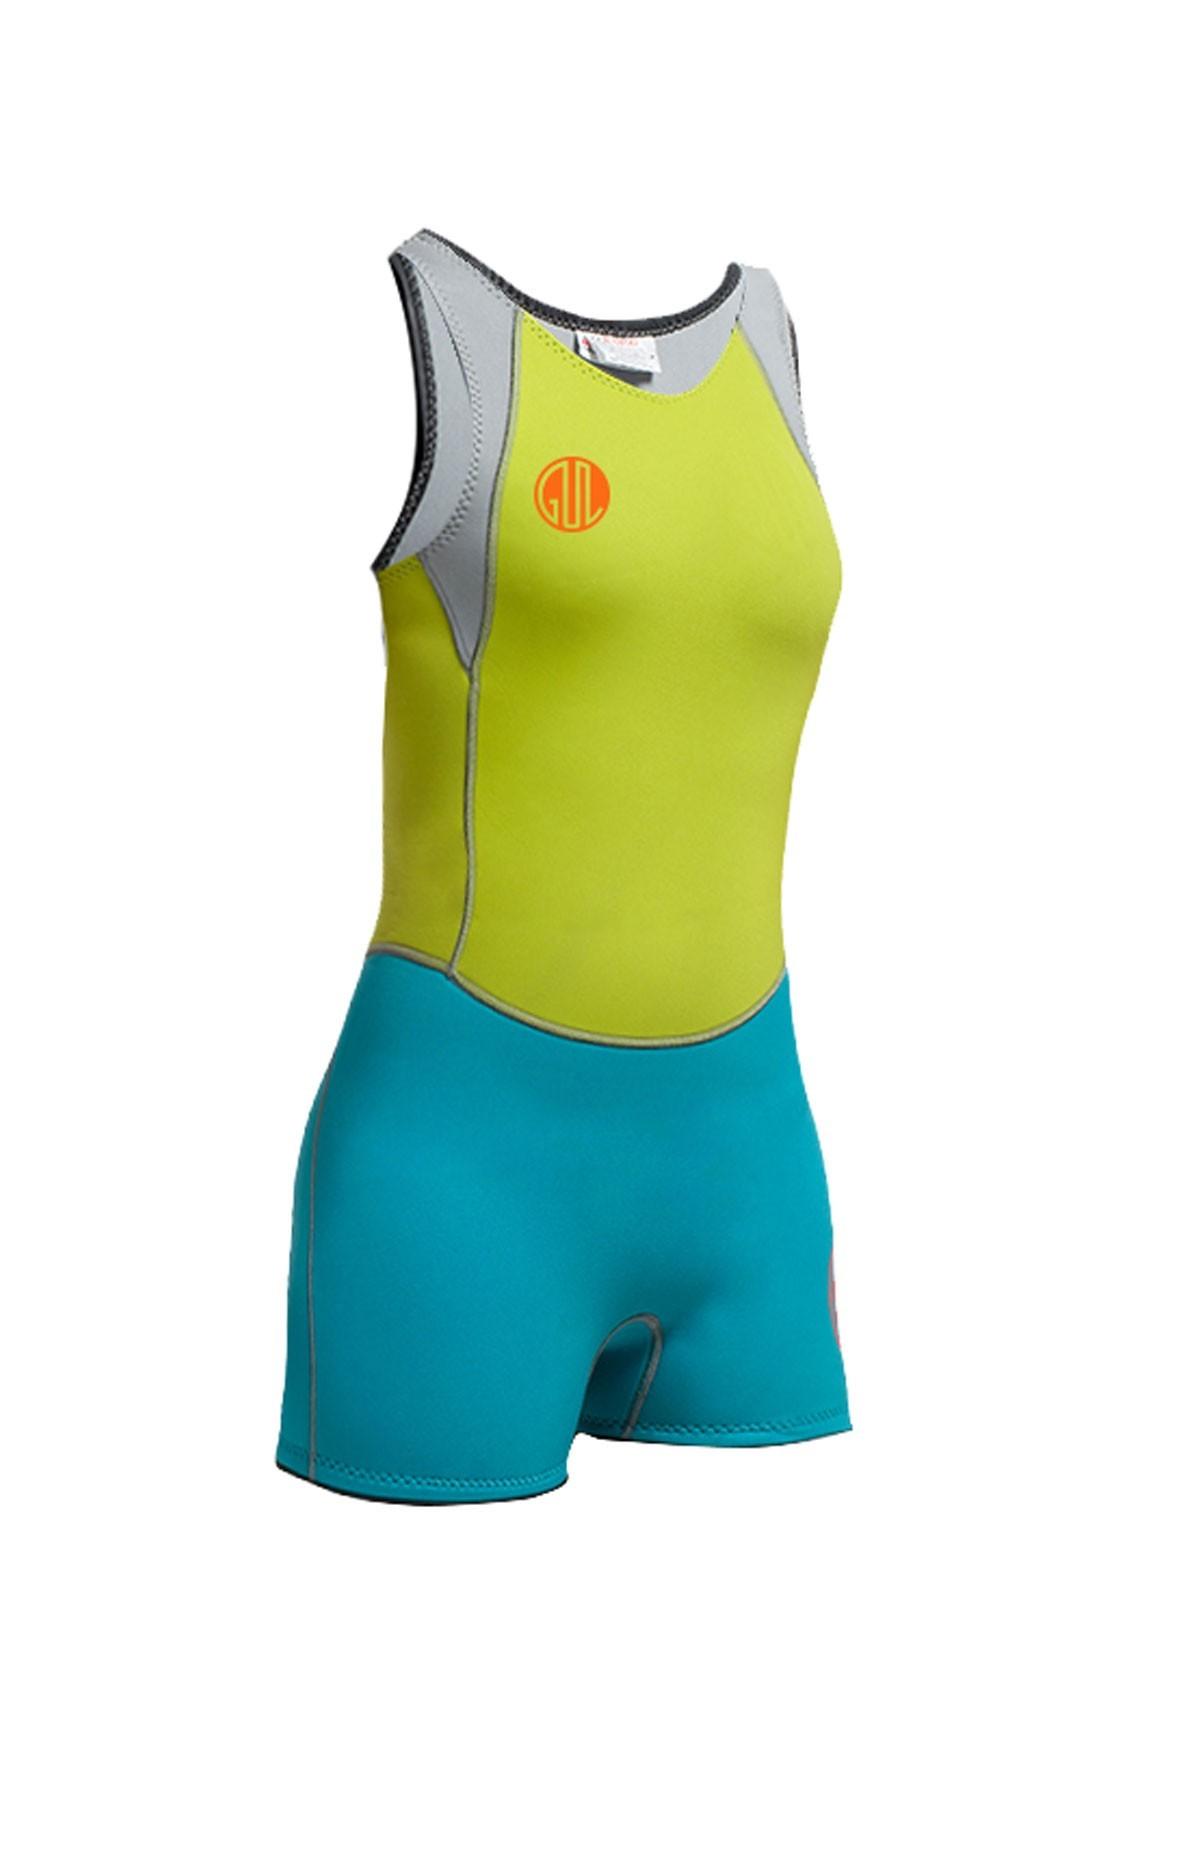 Surflite 3mm ShortJane / Traje de Neopren Corto Mujer